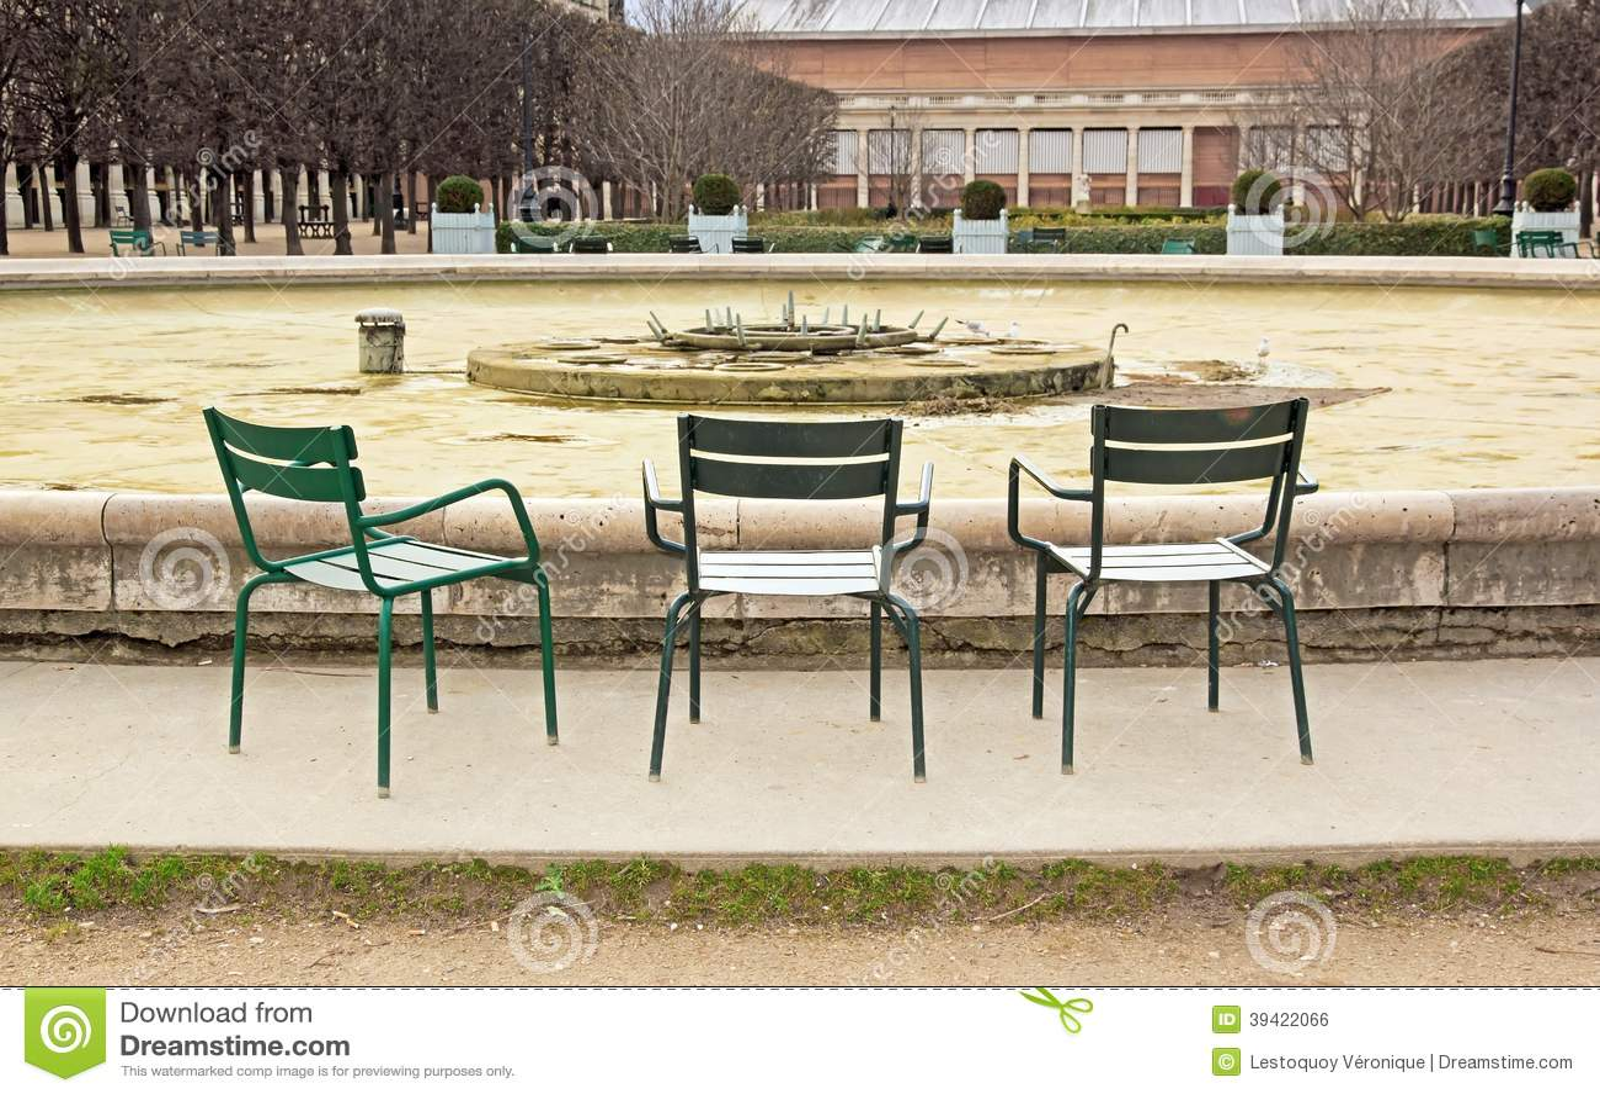 Jardin Du Palais Royal In Winter Paris France Stock Photo Image